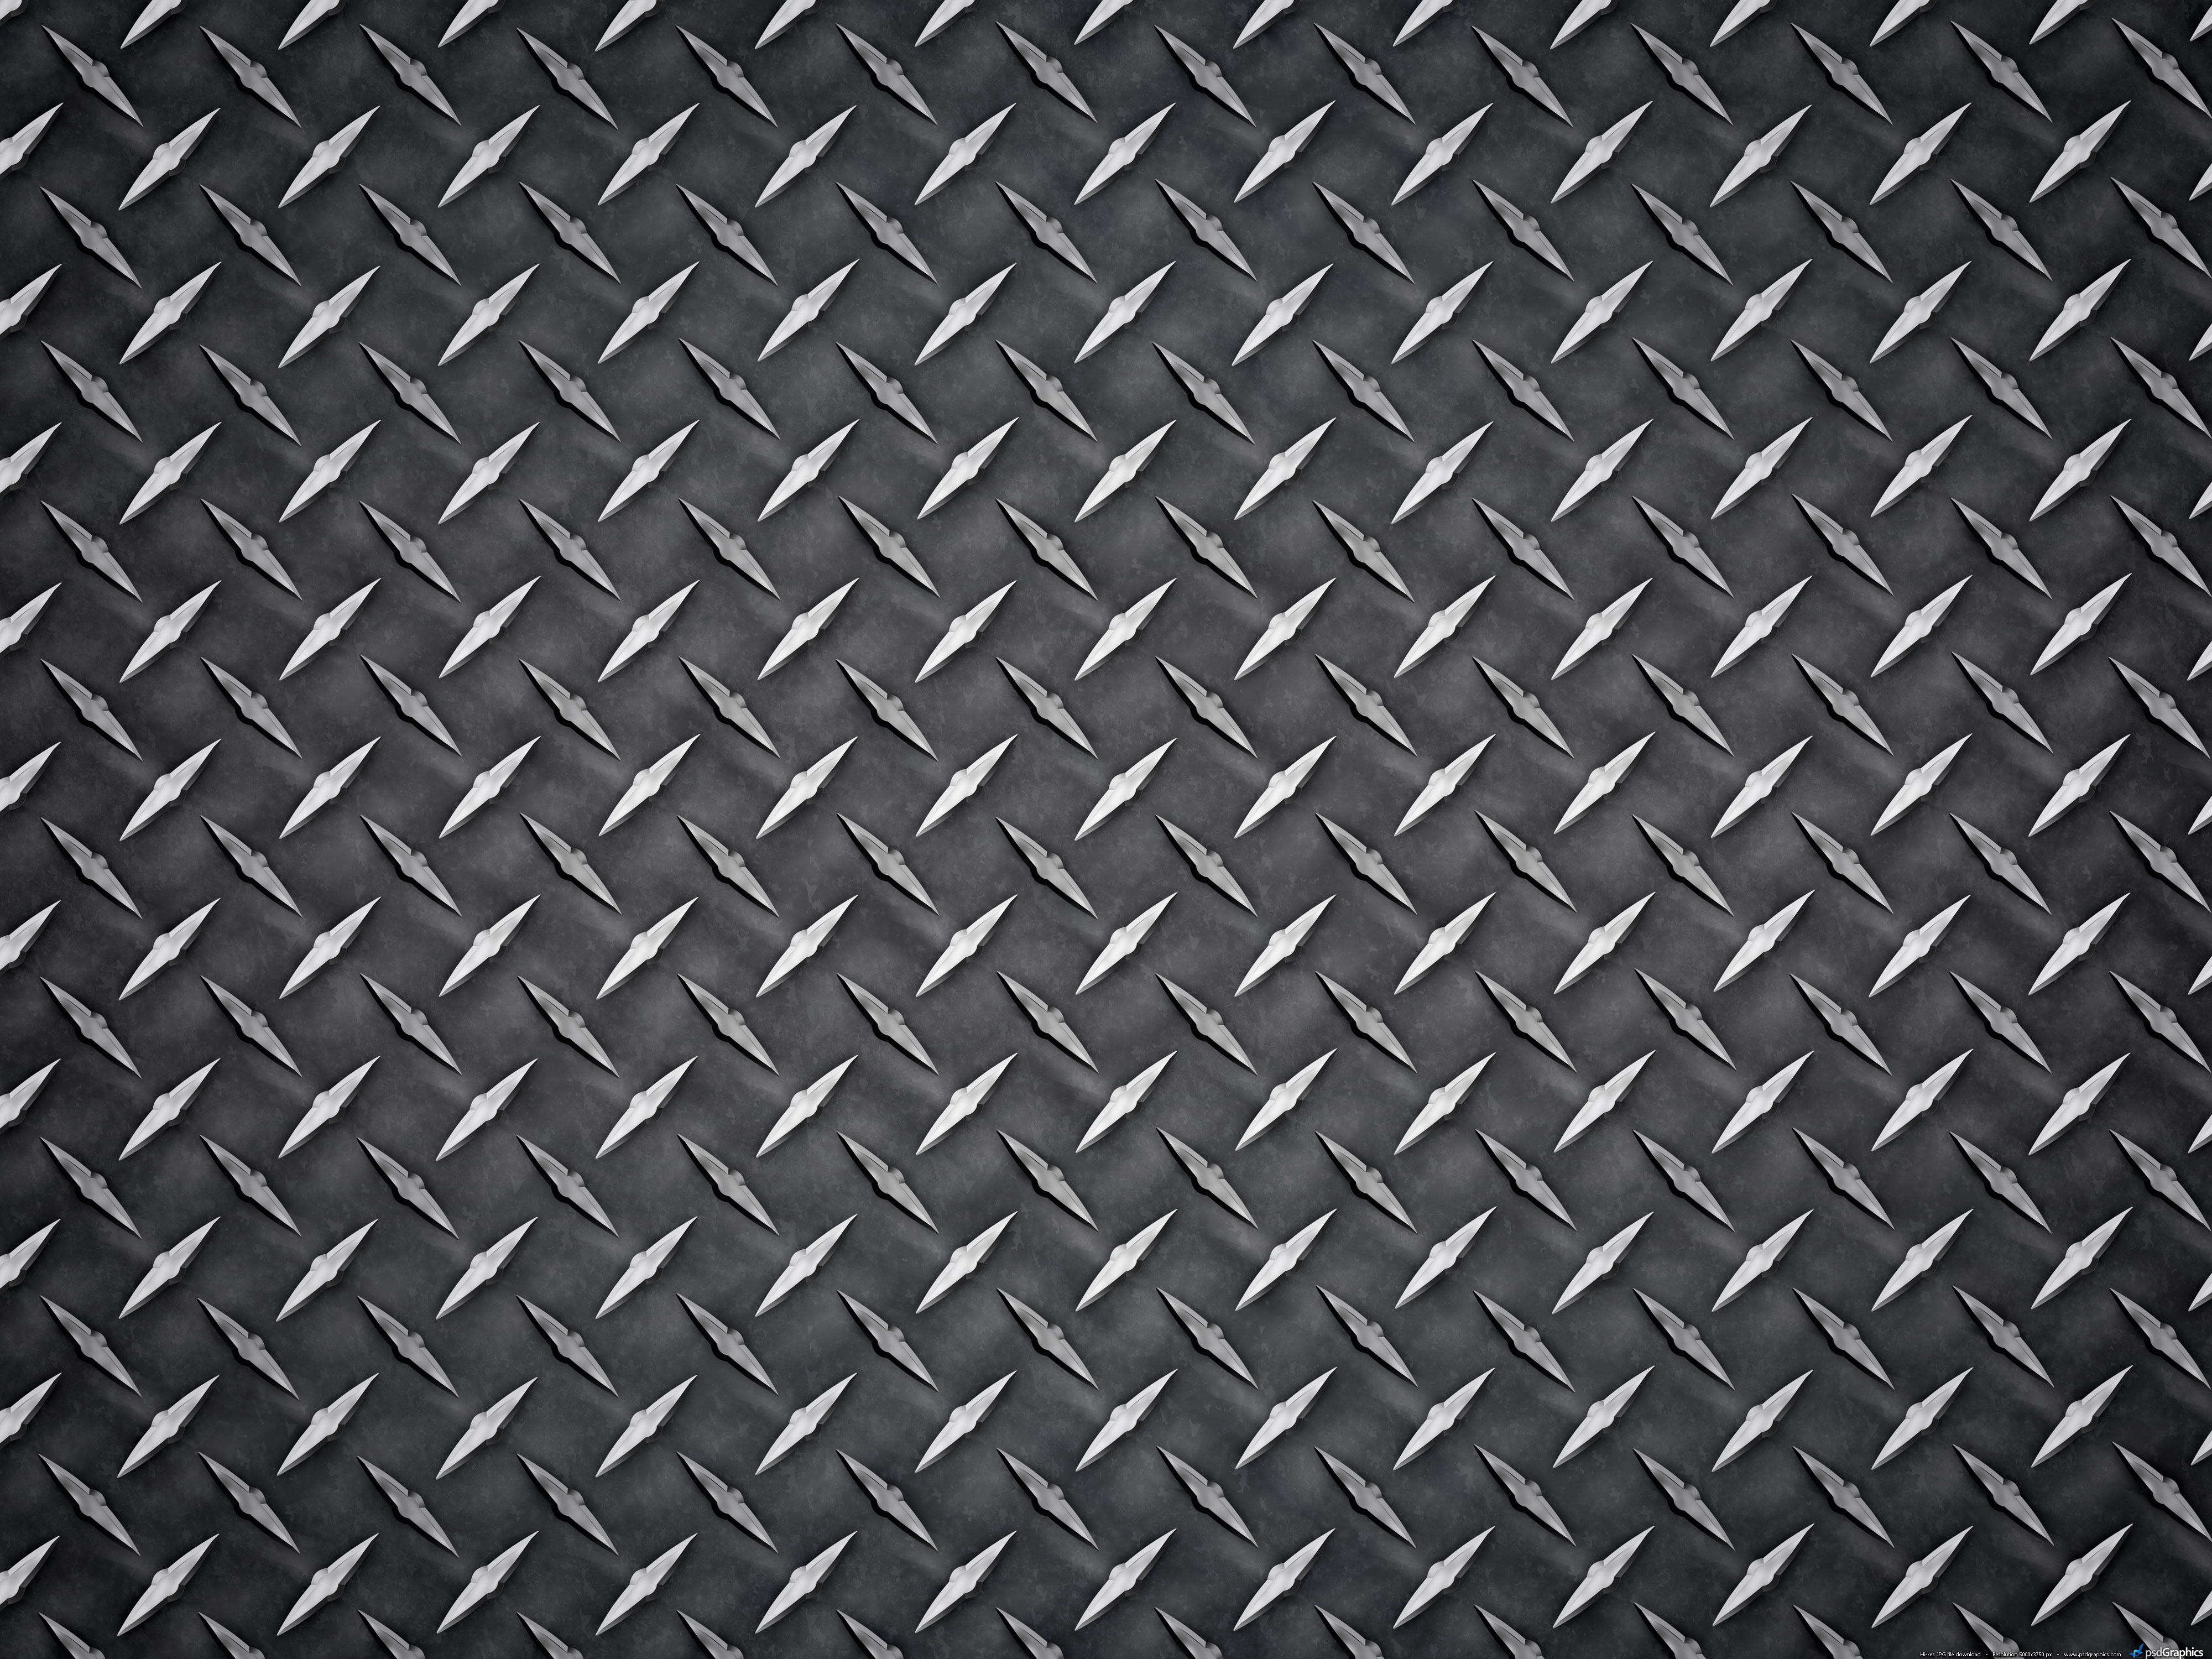 Metal diamond plate texture | PSDGraphics